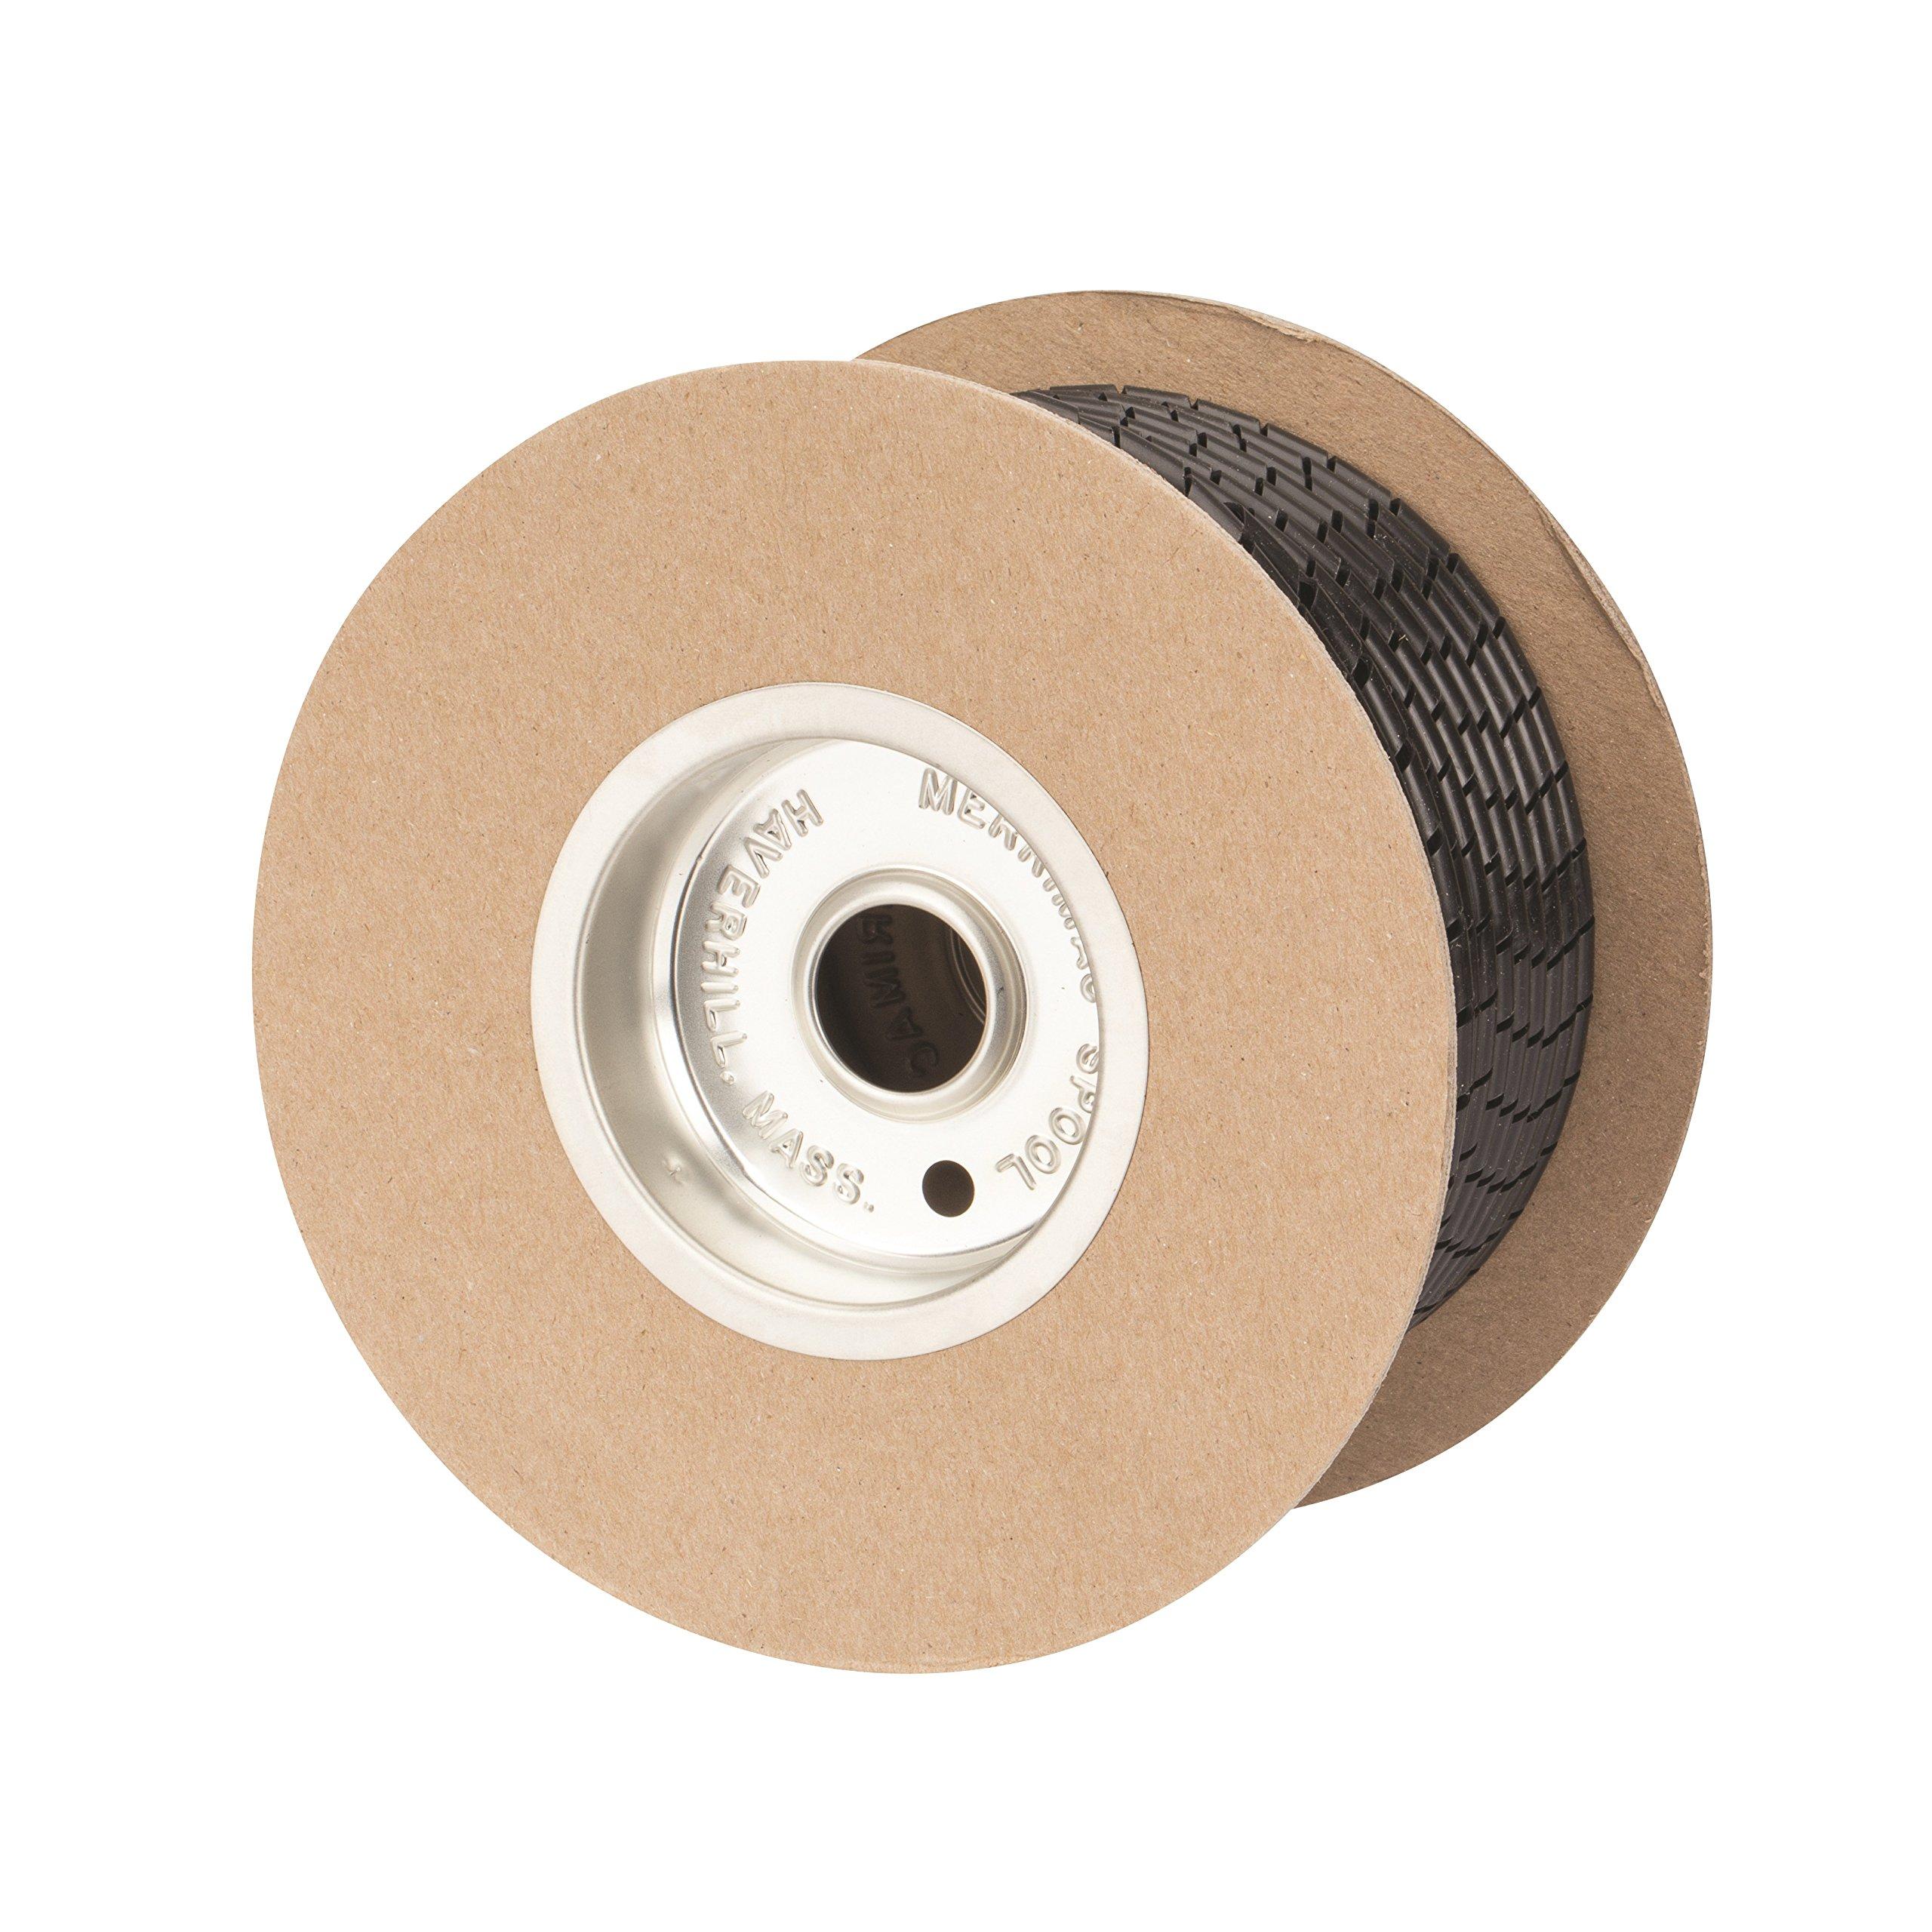 UV Polyethylene Spiral Wrap Cable Harness, 0.236'' OD x 0.157'' ID, 0.157'' - 1.97'' Bundle Range, Black by NSI (Image #3)